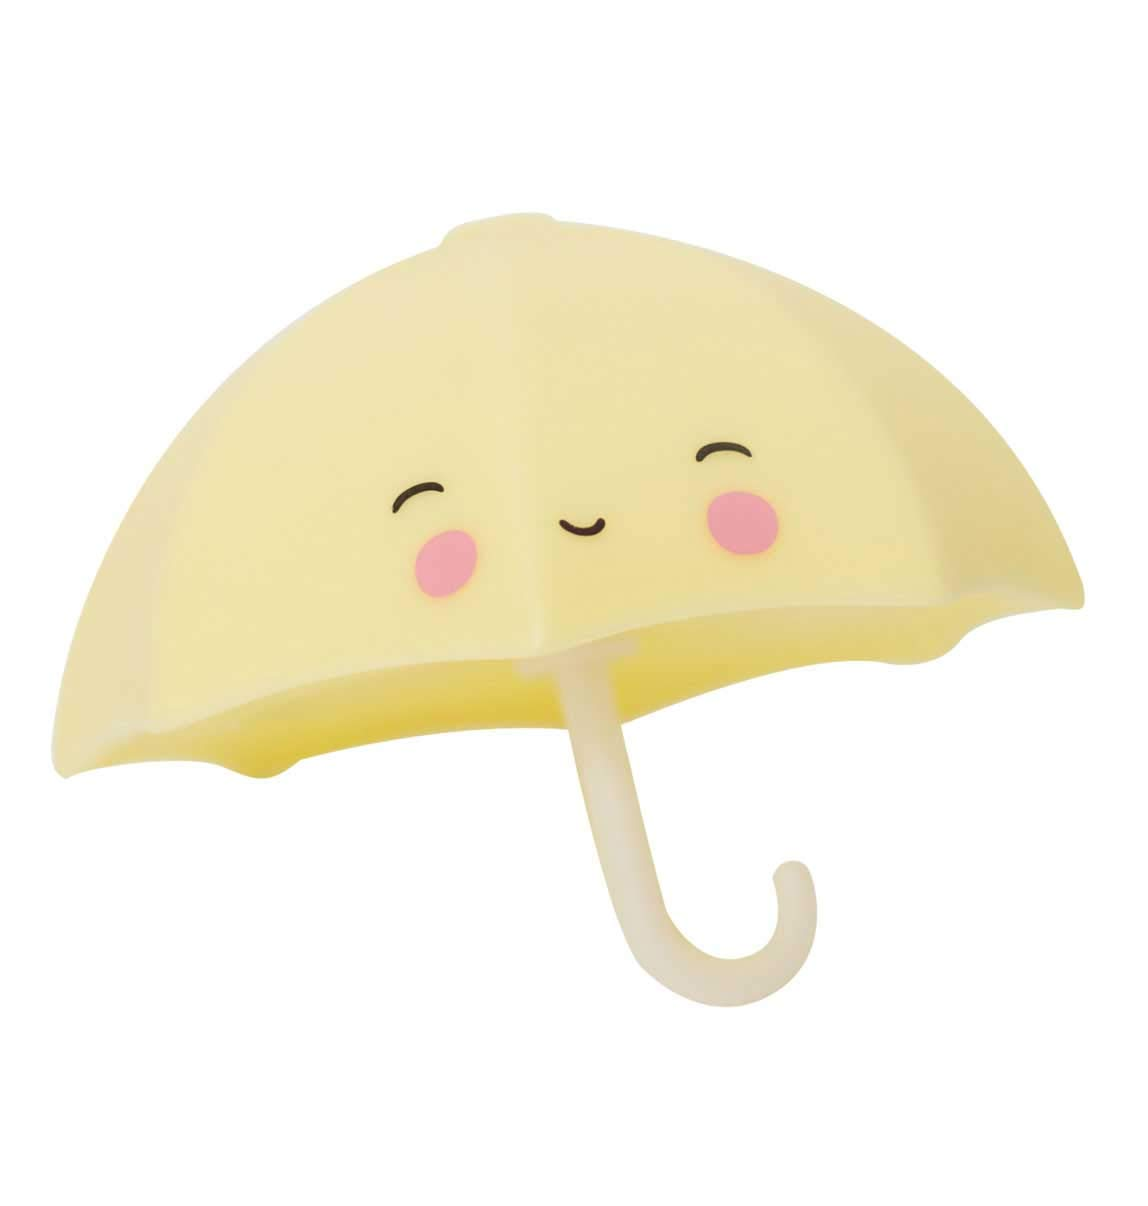 A Little Lovely Company Bath Toy Umbrella btumyl02, Toy Bath in The Form of Umbrella, 9x 7x 9cm